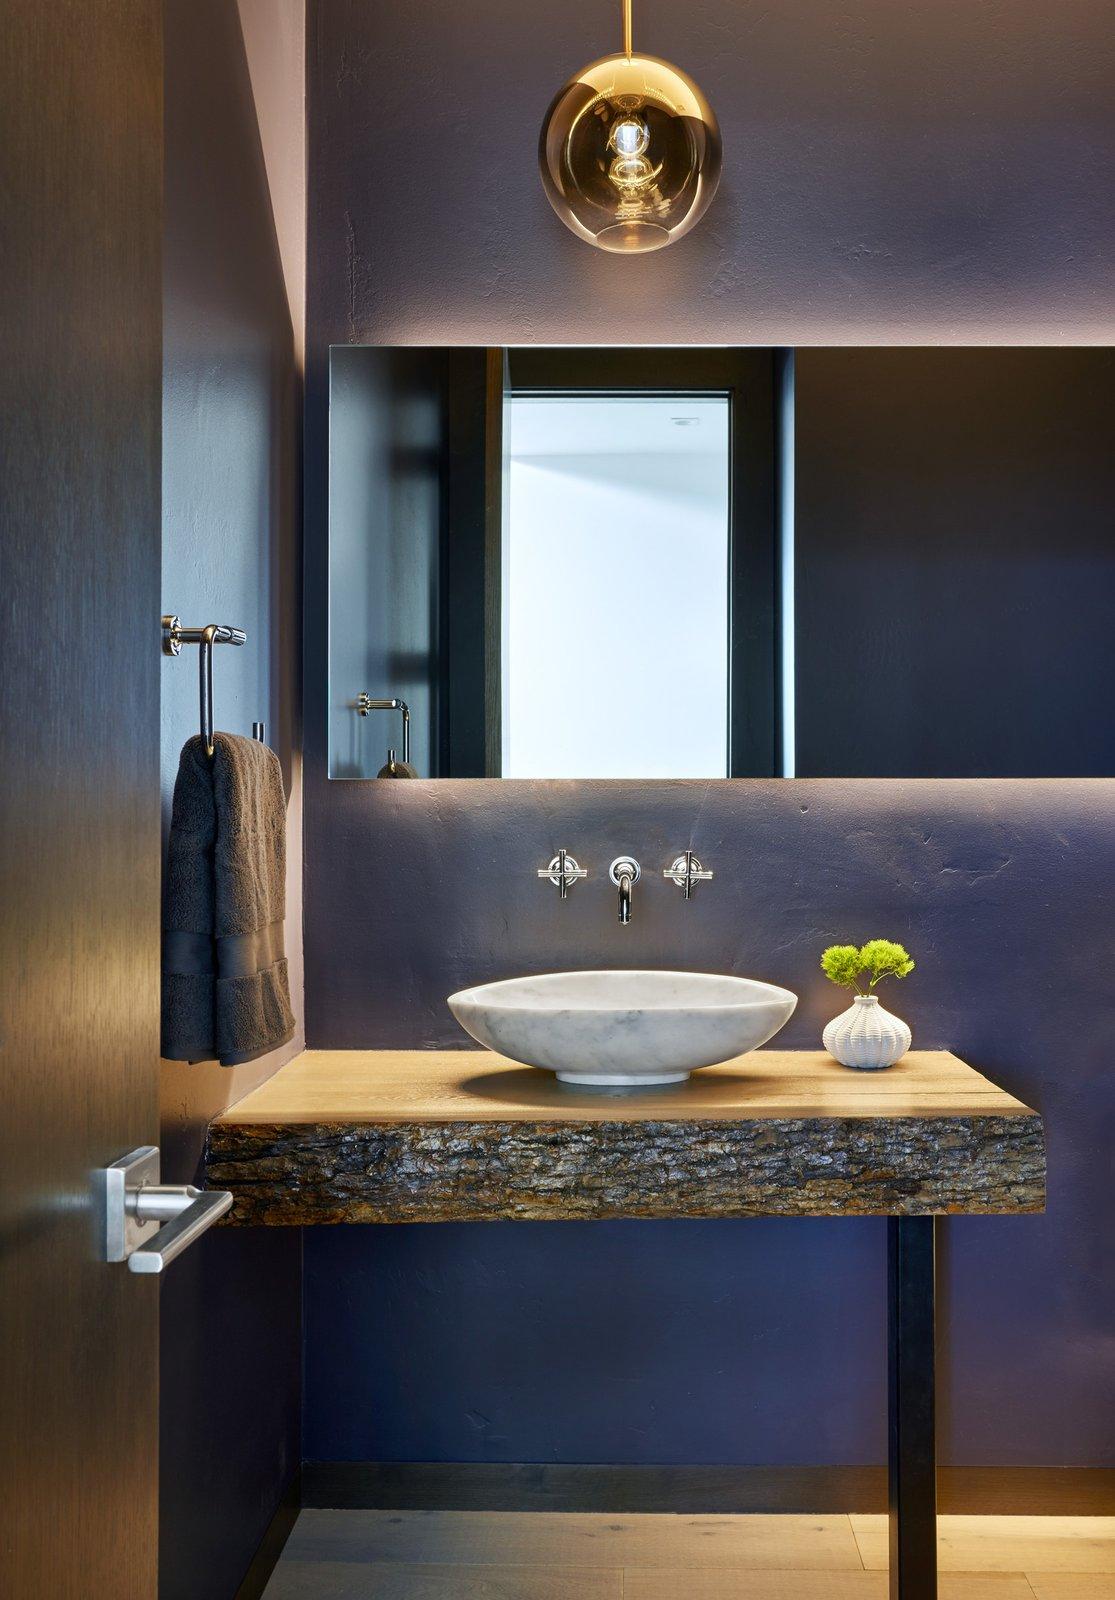 Bath Room, Wood Counter, Pendant Lighting, Vessel Sink, and Medium Hardwood Floor  Terrace Drive by KA DesignWorks